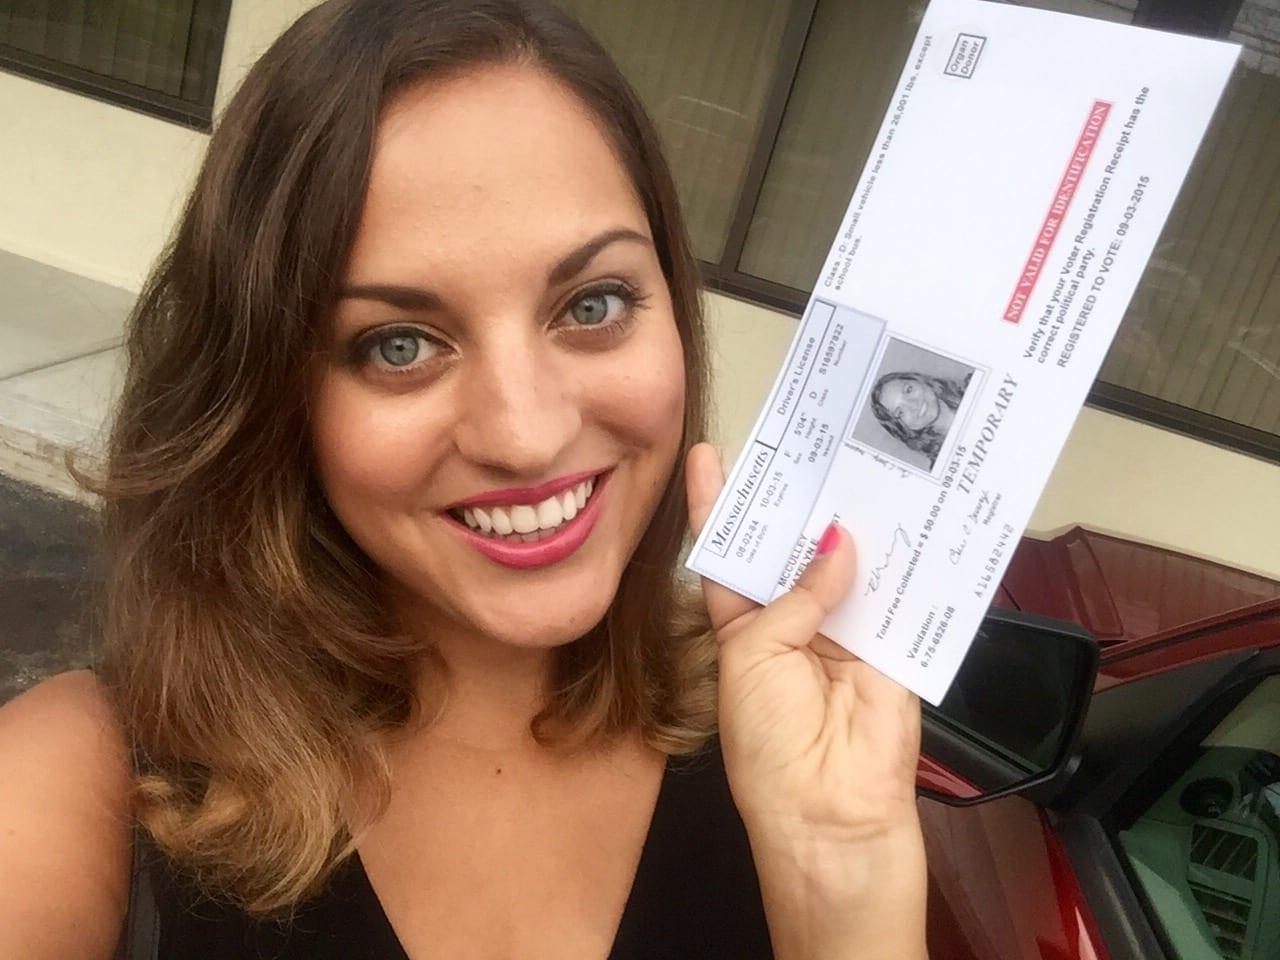 Kate's New License